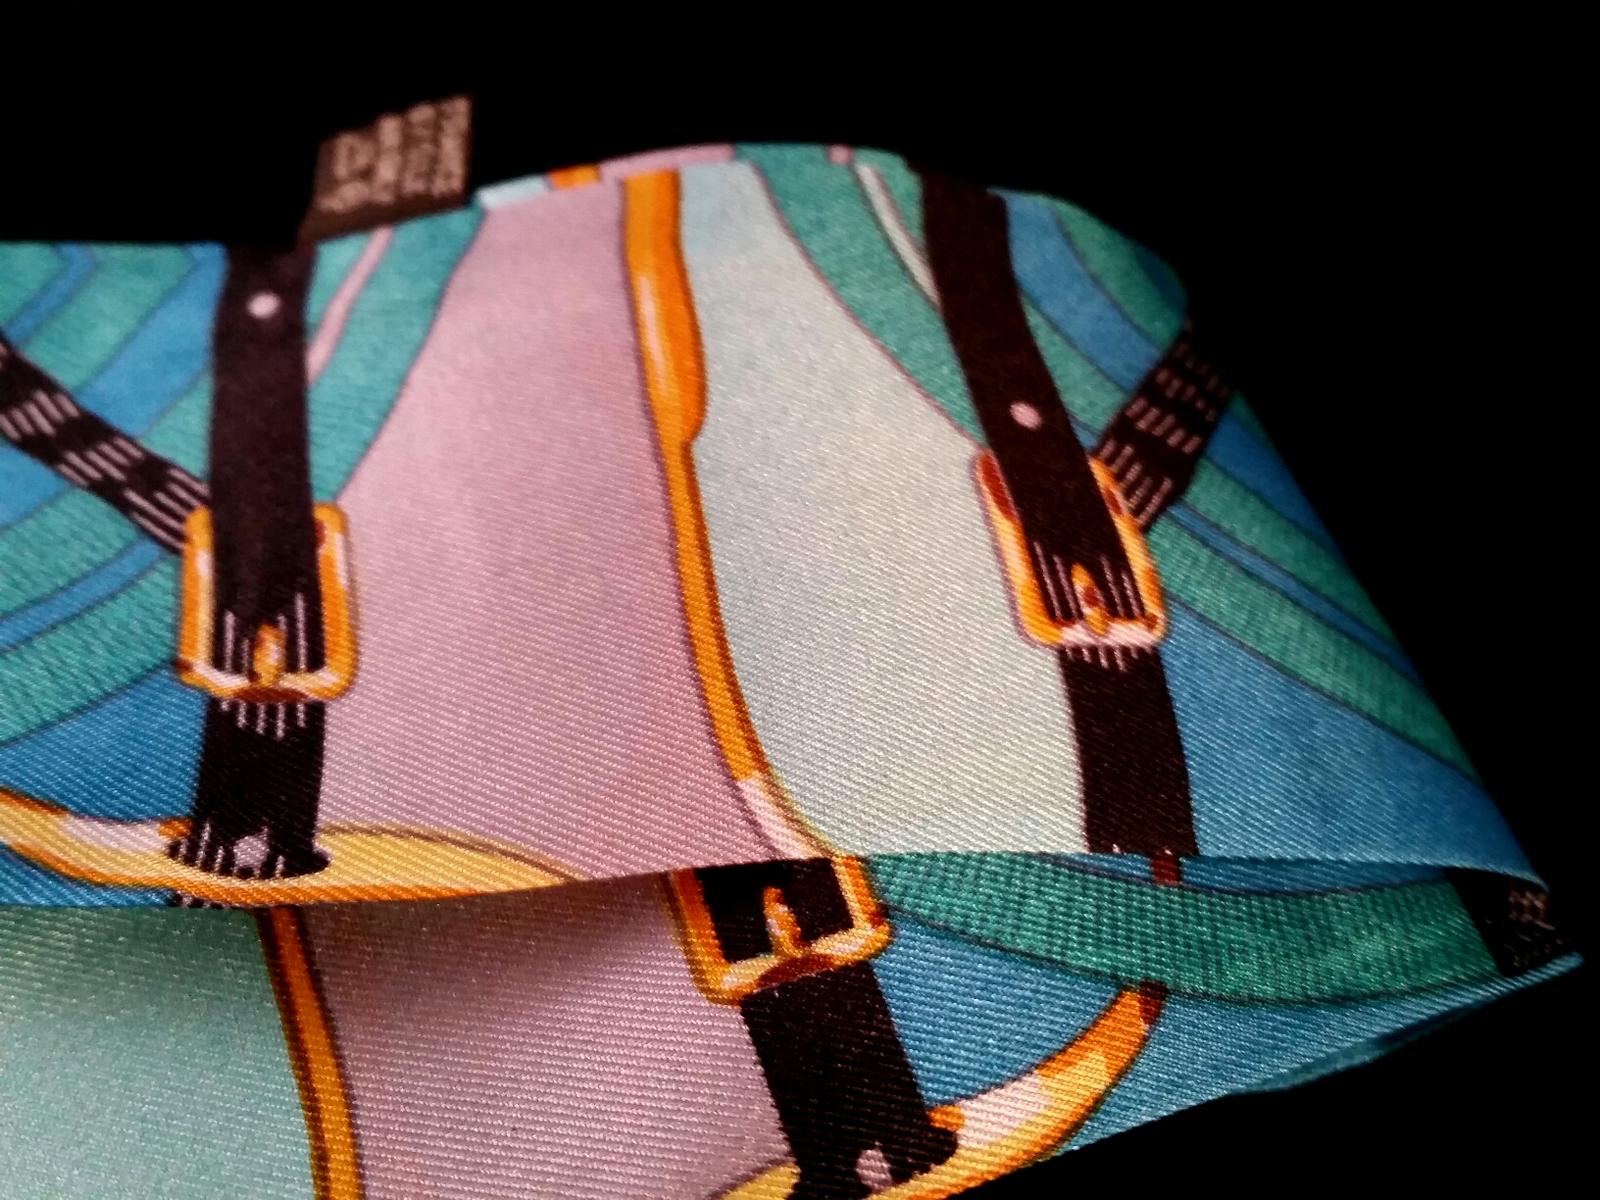 St. Germain Twilly Scarf Blues Greens Horse Buckle Purse Twill Weave Luxury